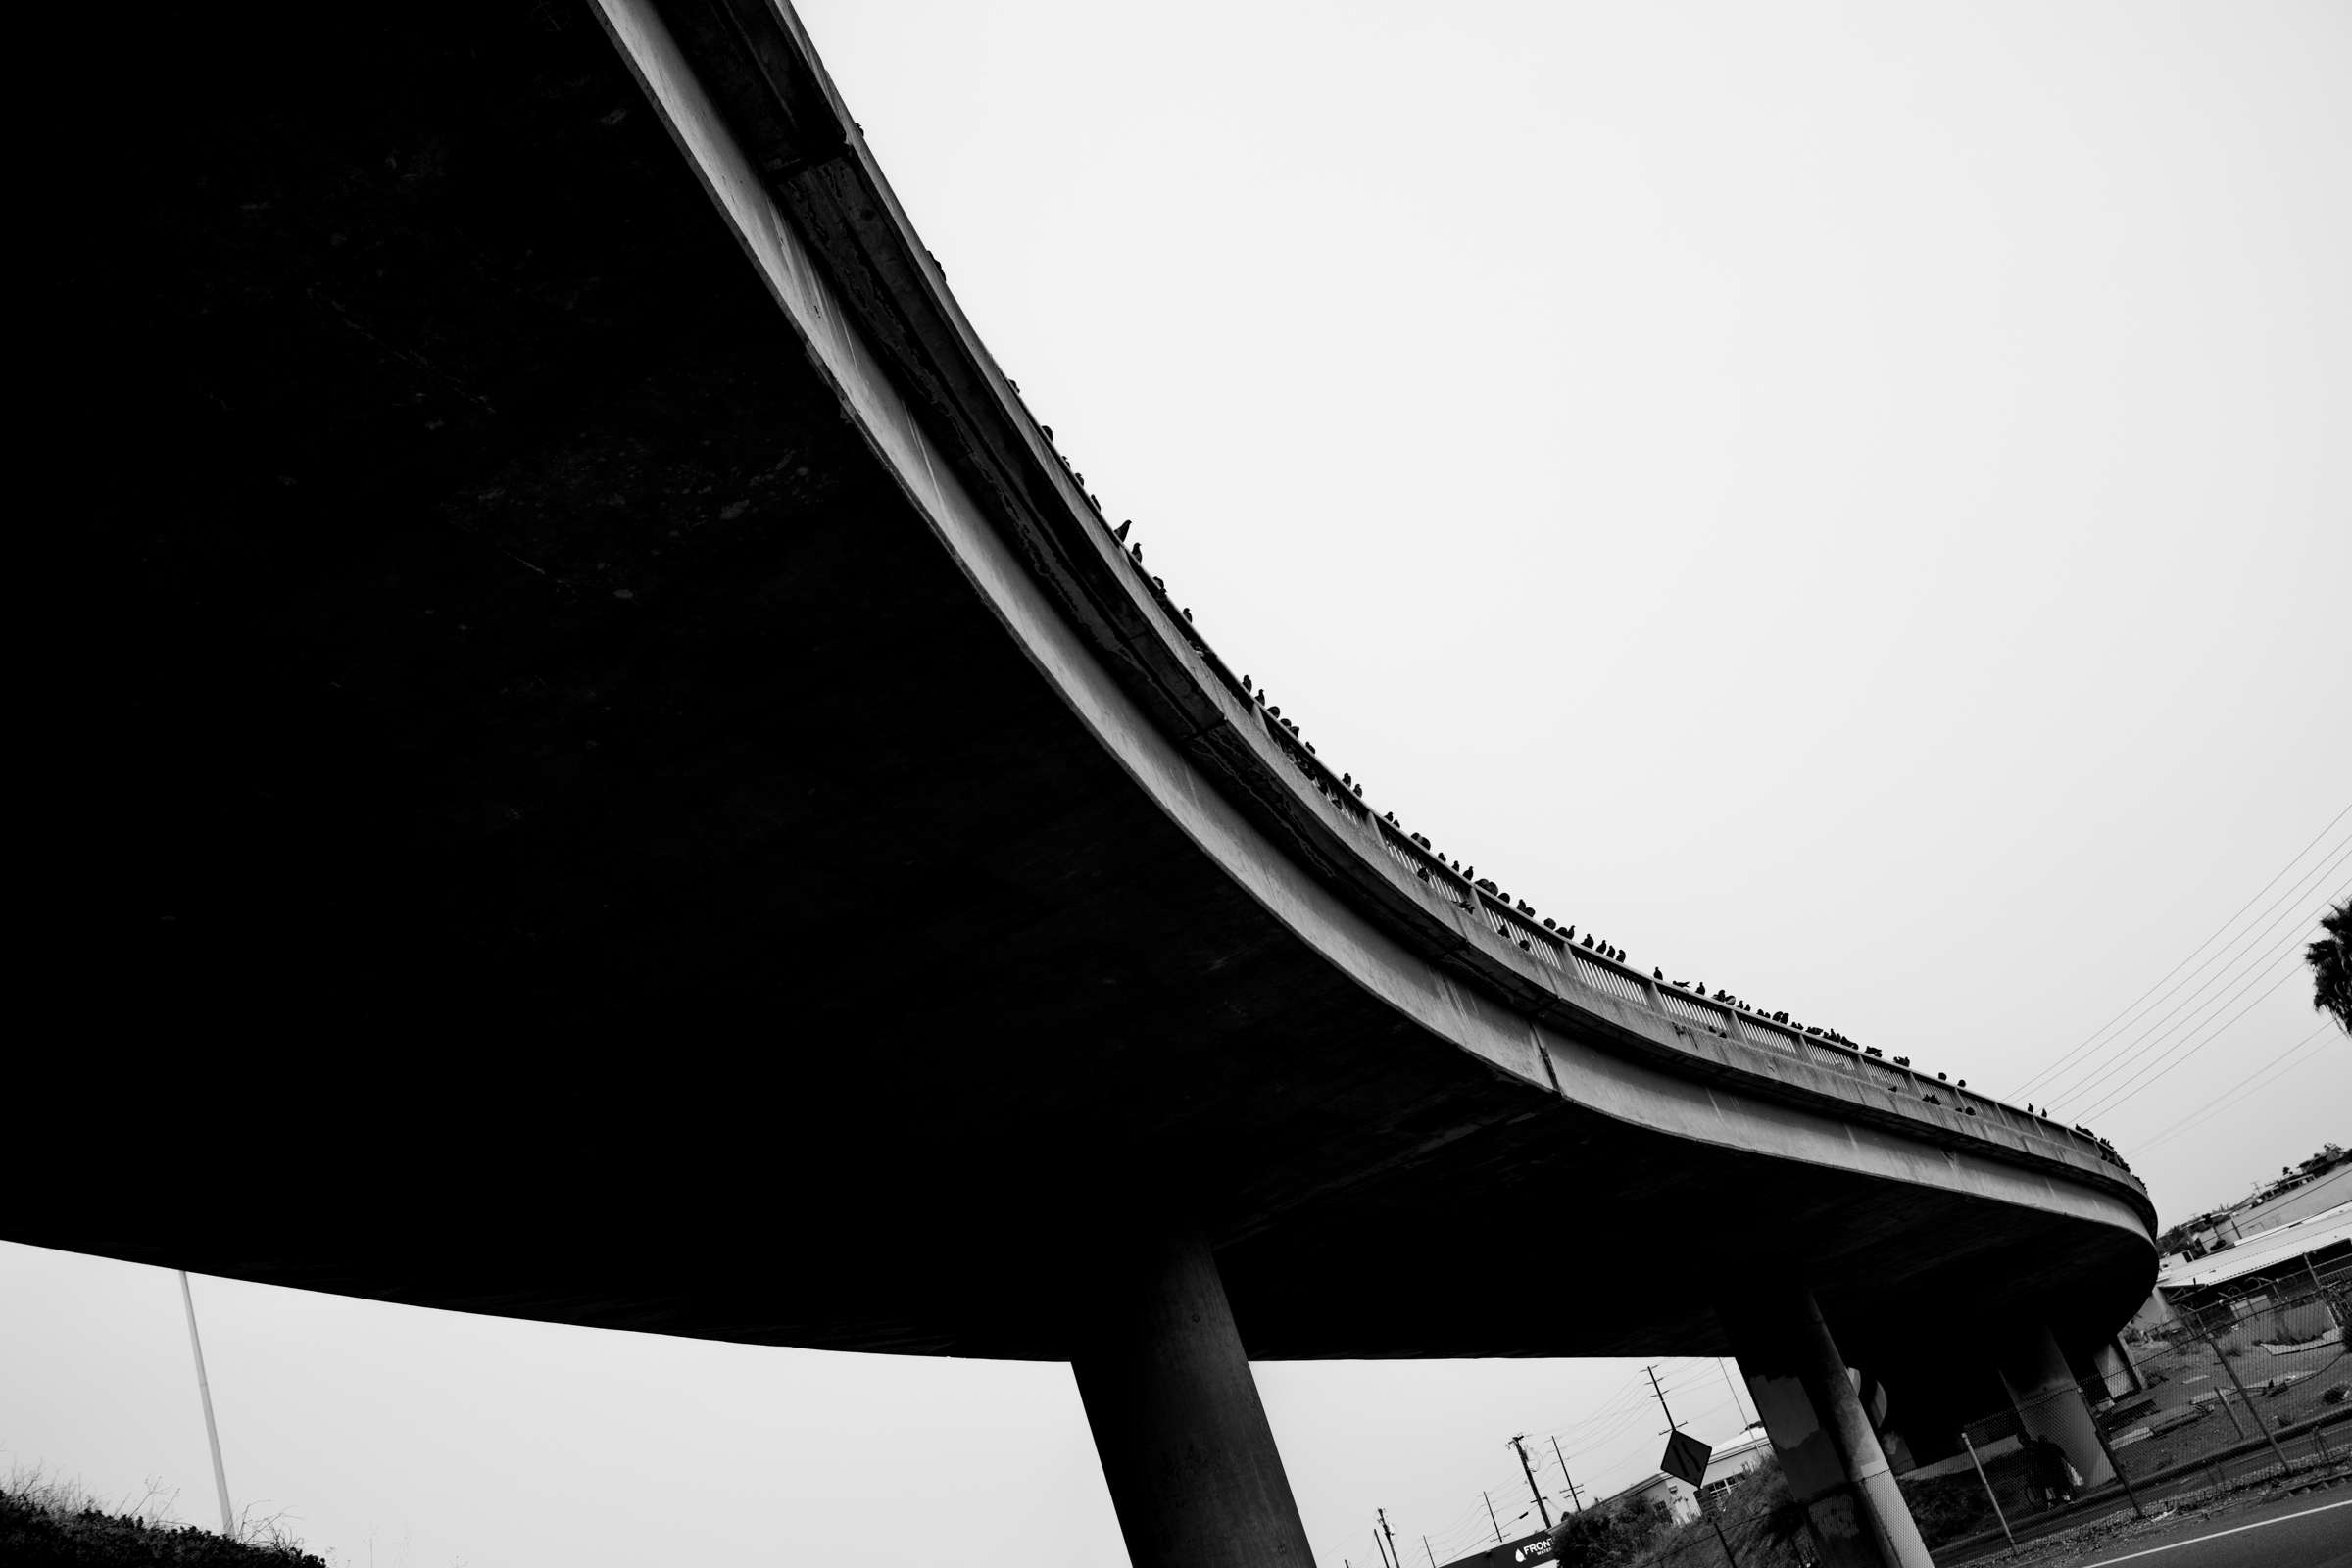 Bridge - Spy Optics